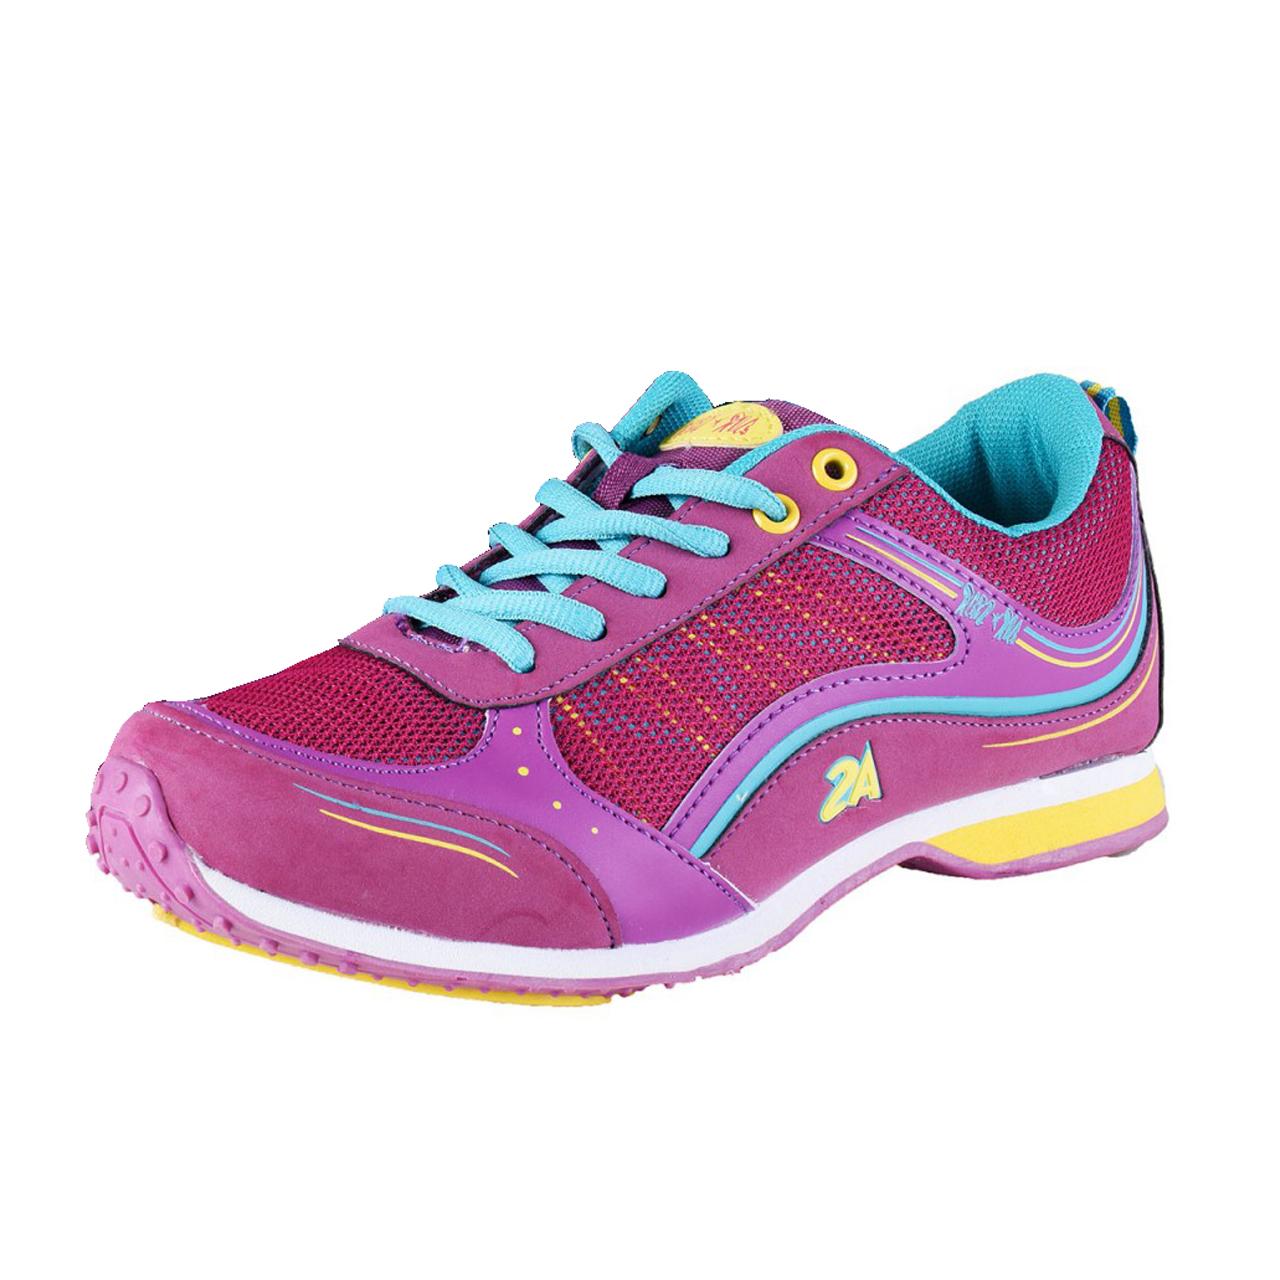 AIR STAR Damen Sneaker, Violett/Multi